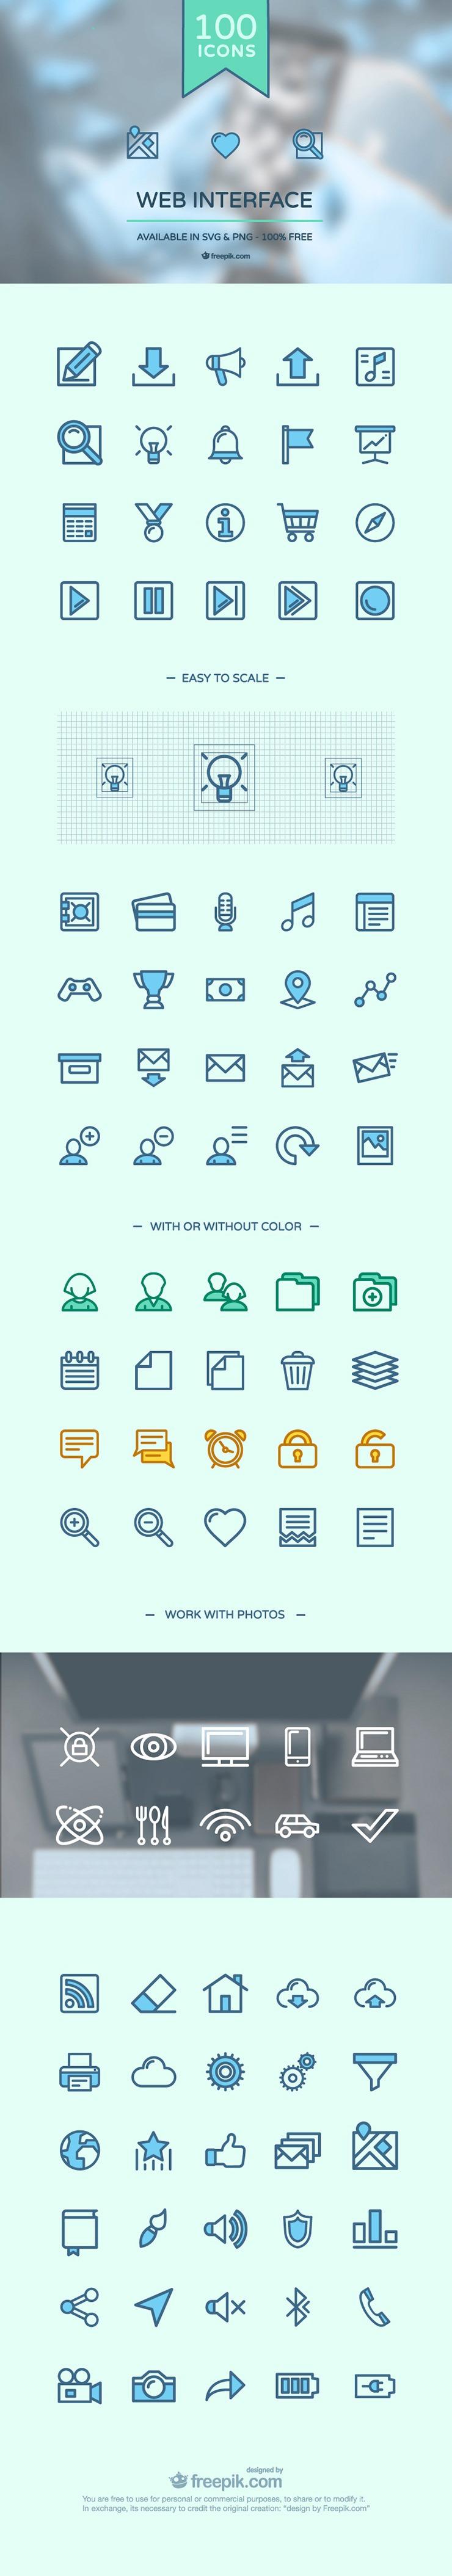 100 web interface icons thumb 1000+ bundle of amazing free design resources